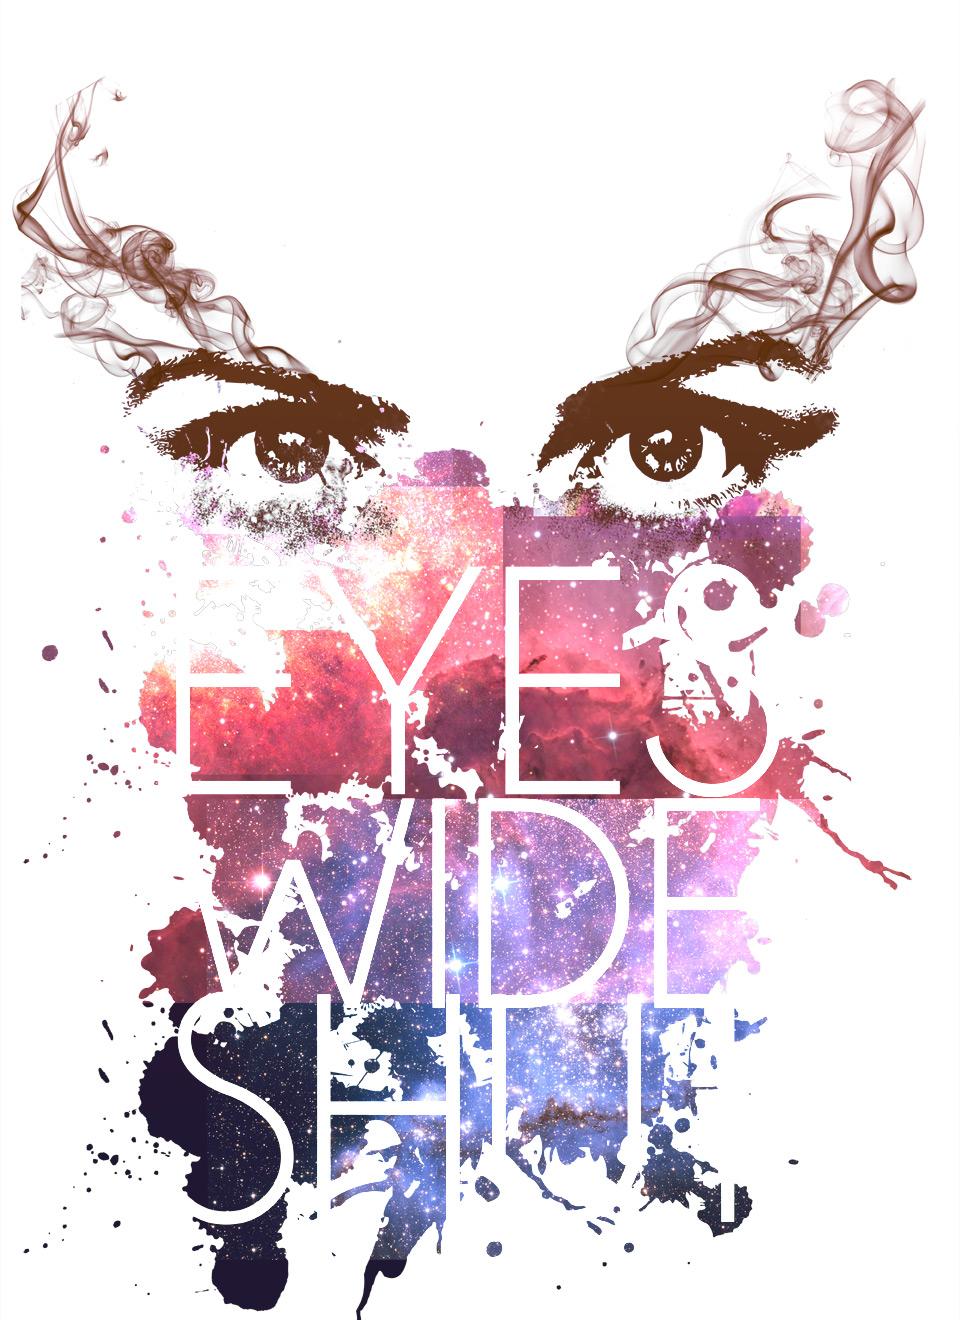 Design t shirt in photoshop - Soul Eyes Float Smoke